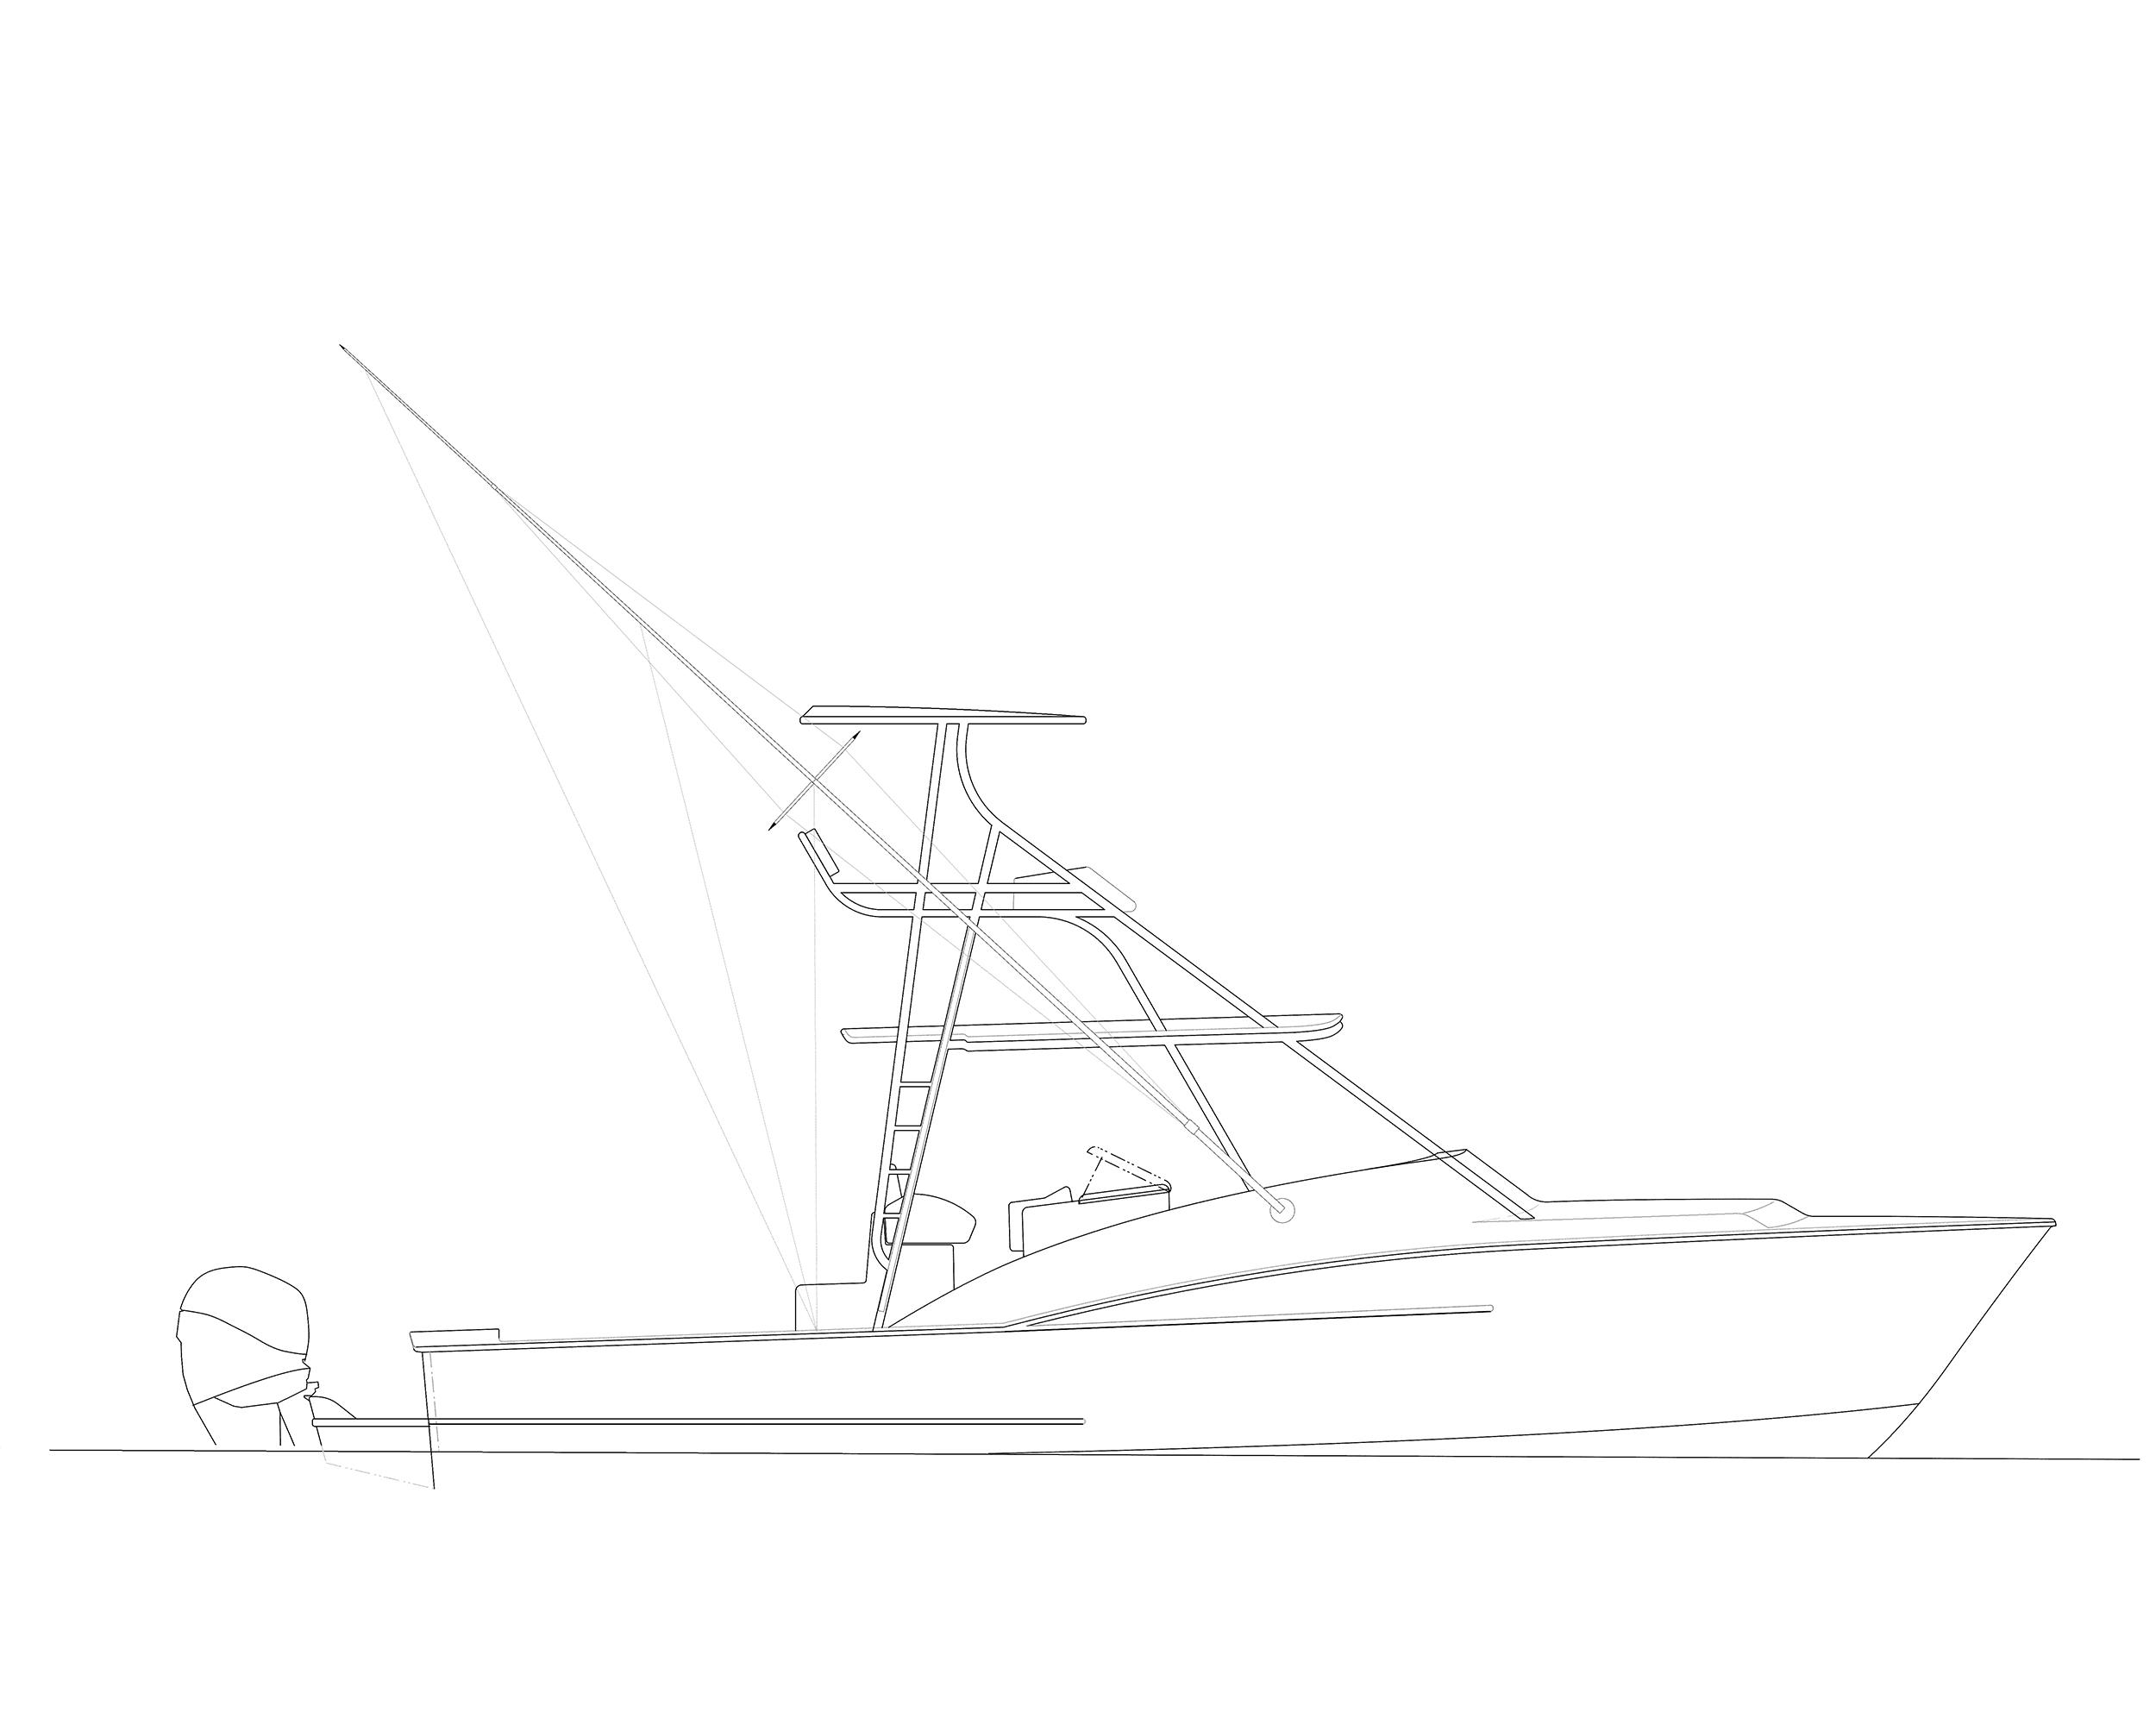 OBX 38 XP FE